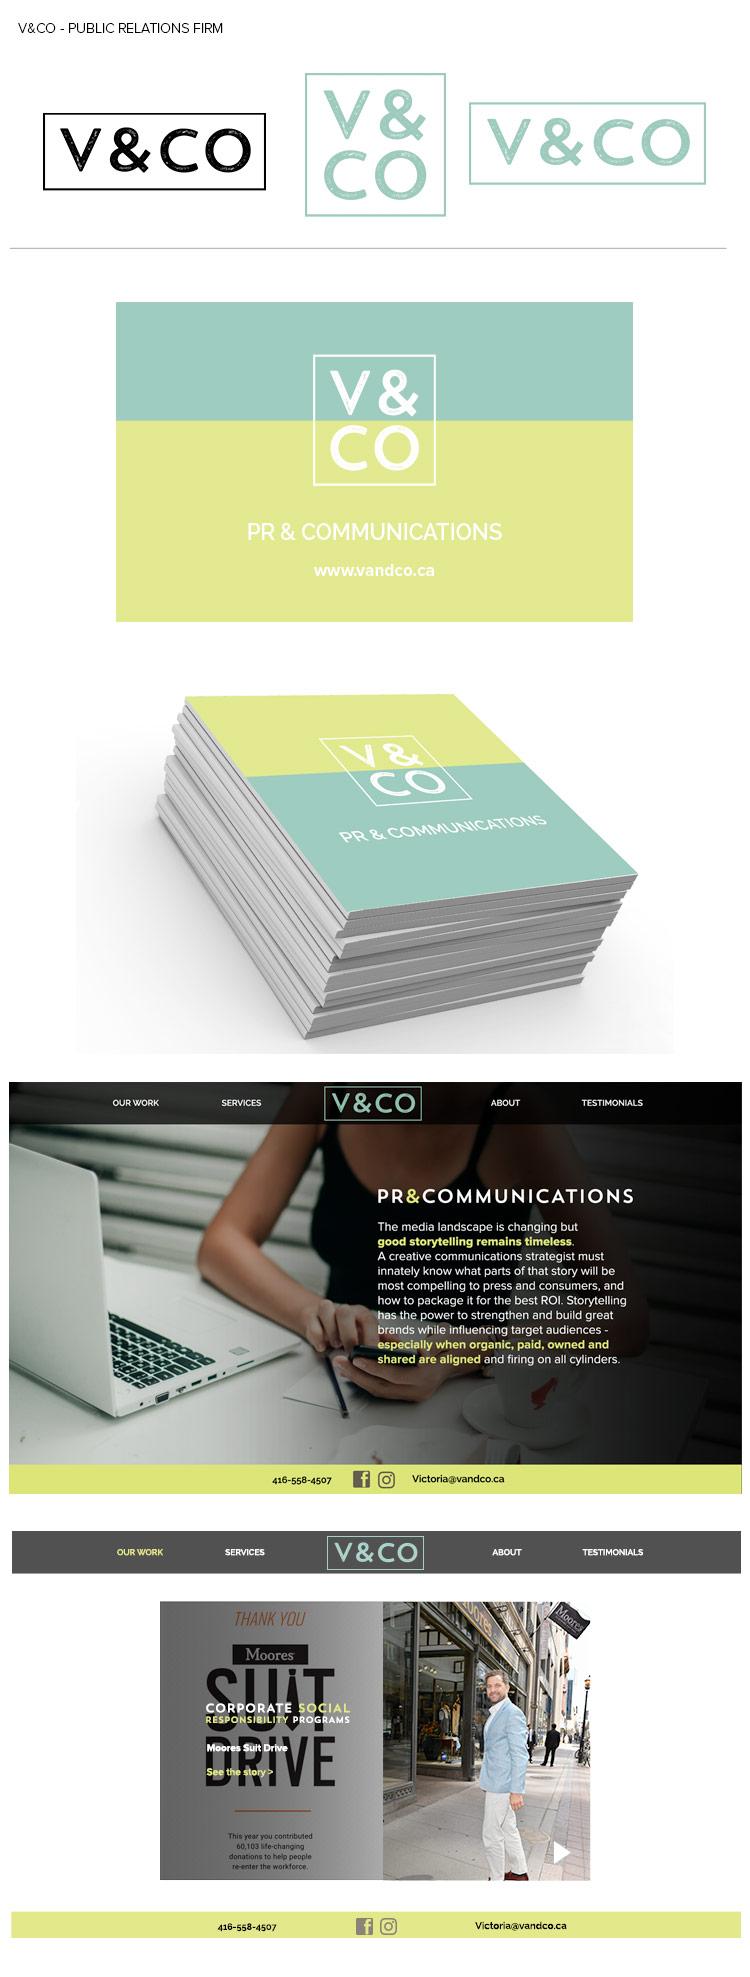 vco_brand.jpg